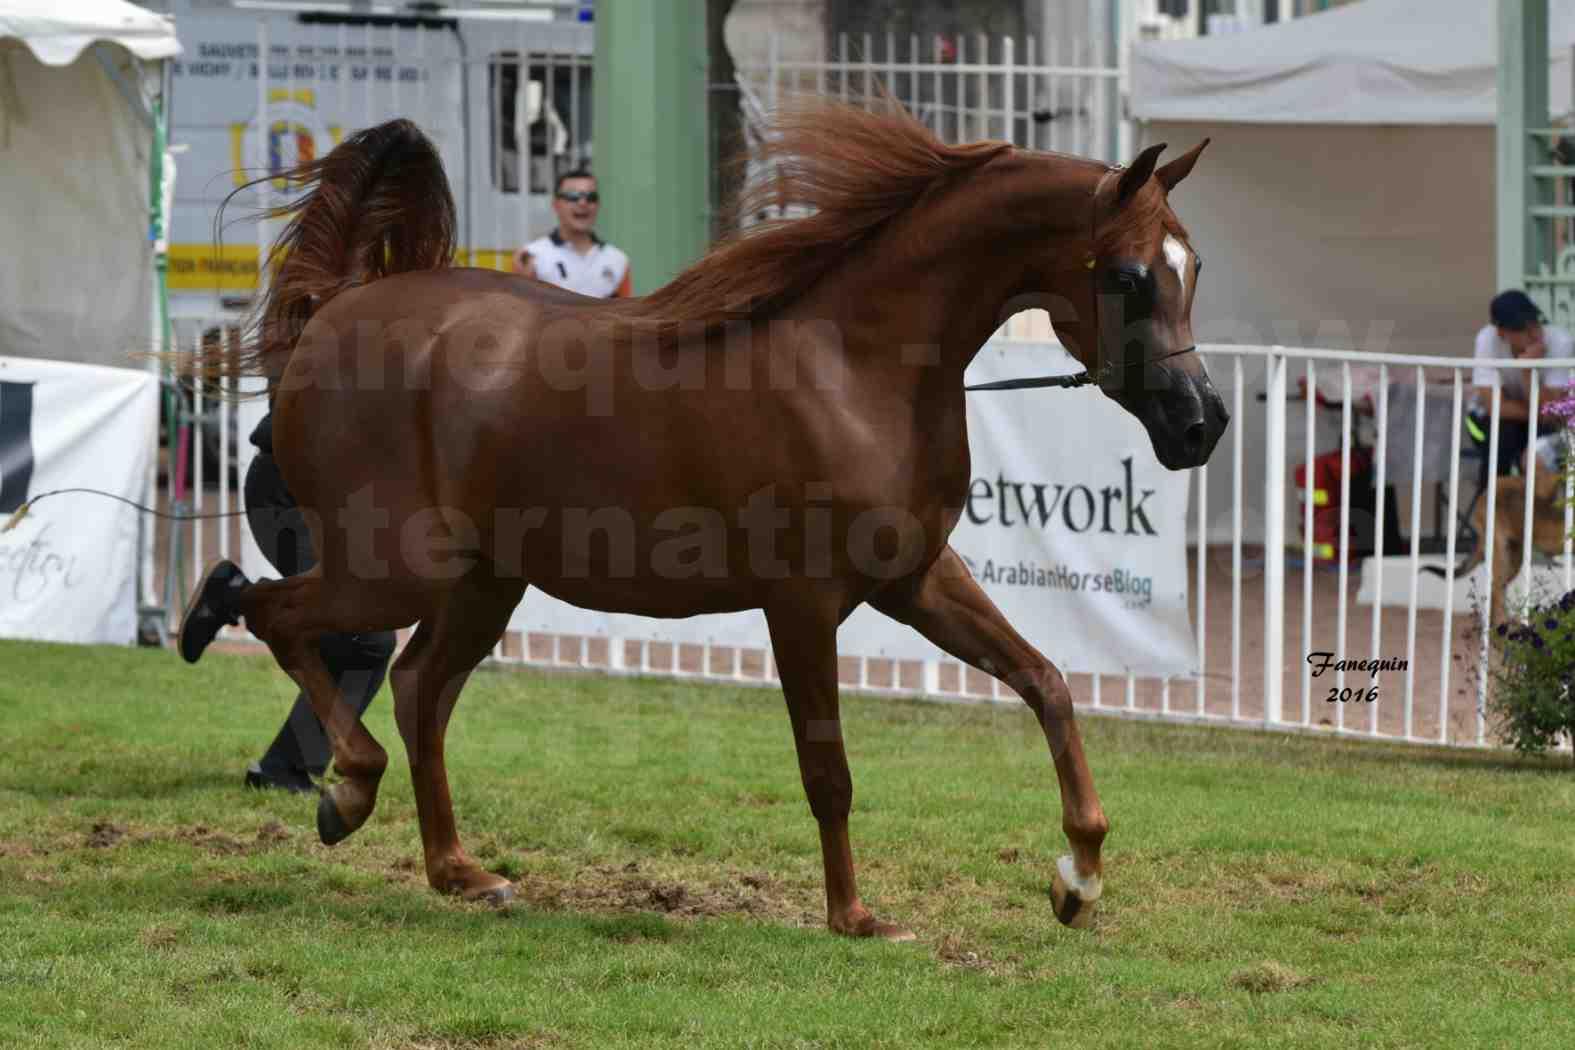 International Arabian Horse Show B de VICHY 2016 - PEARL DE DJOON - Notre Sélection - 27